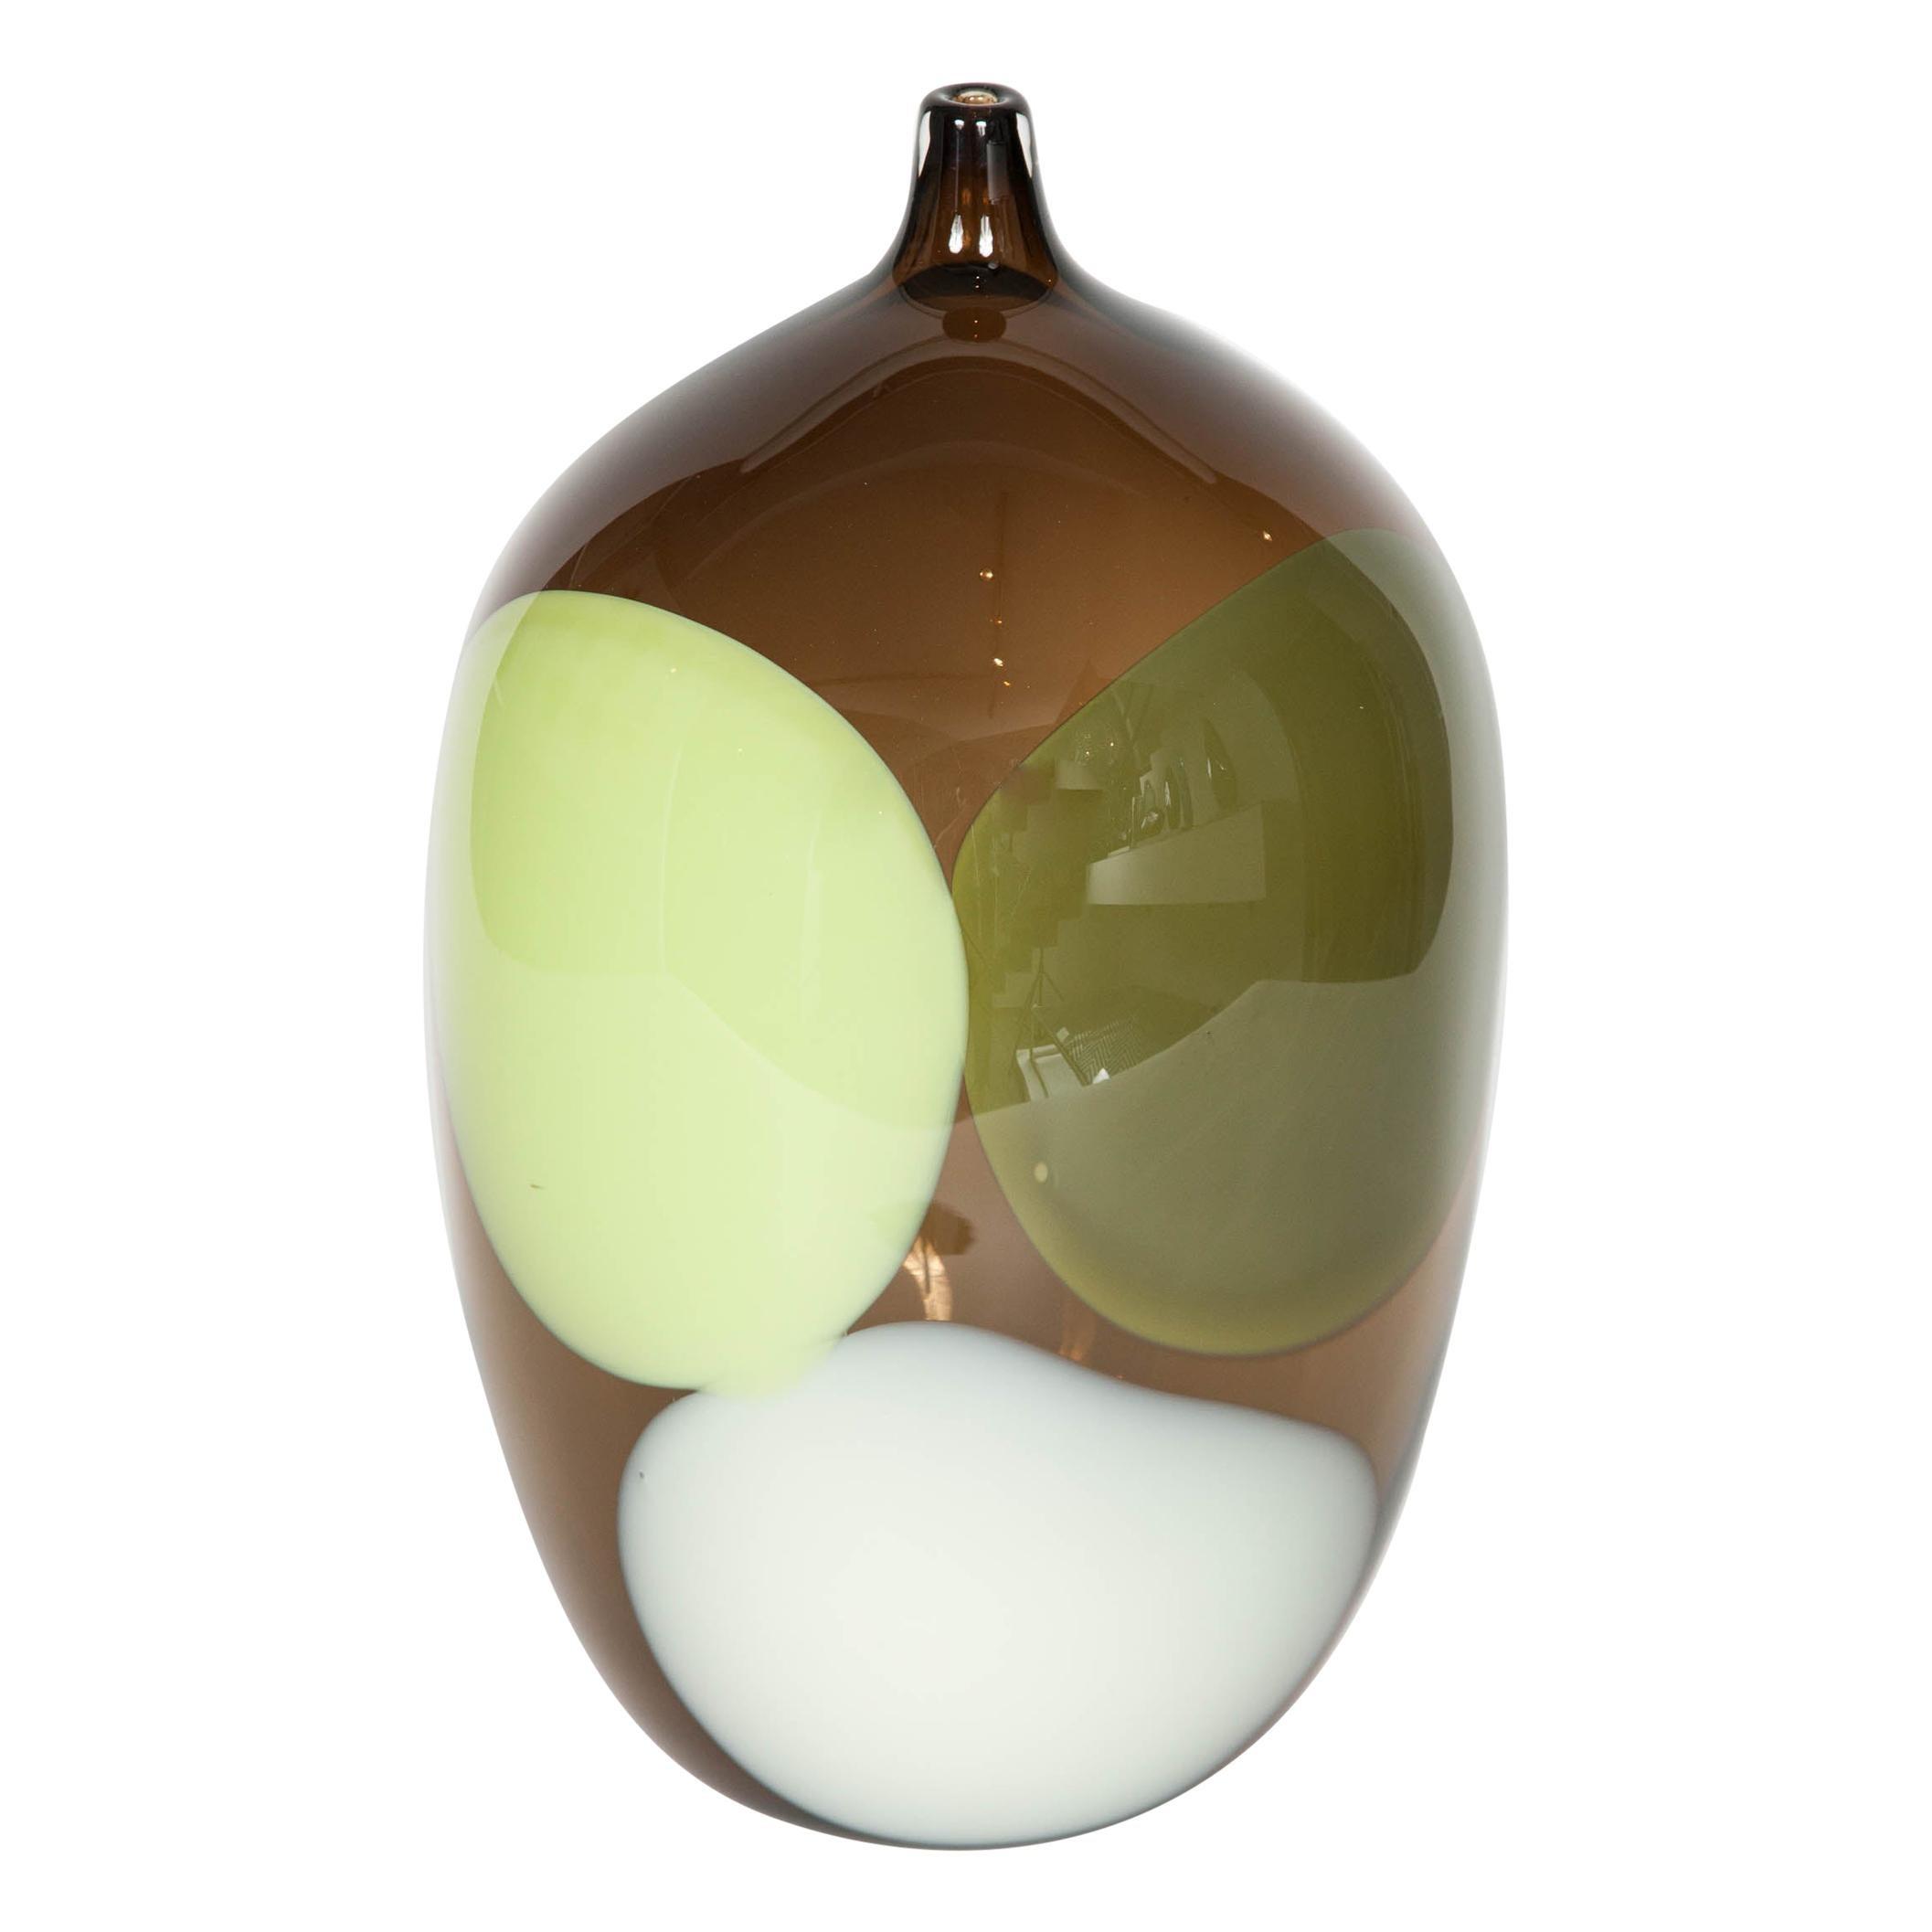 Trillium, a Unique Tobacco Brown, Green & Alabaster Glass Vase by Gunnel Sahlin